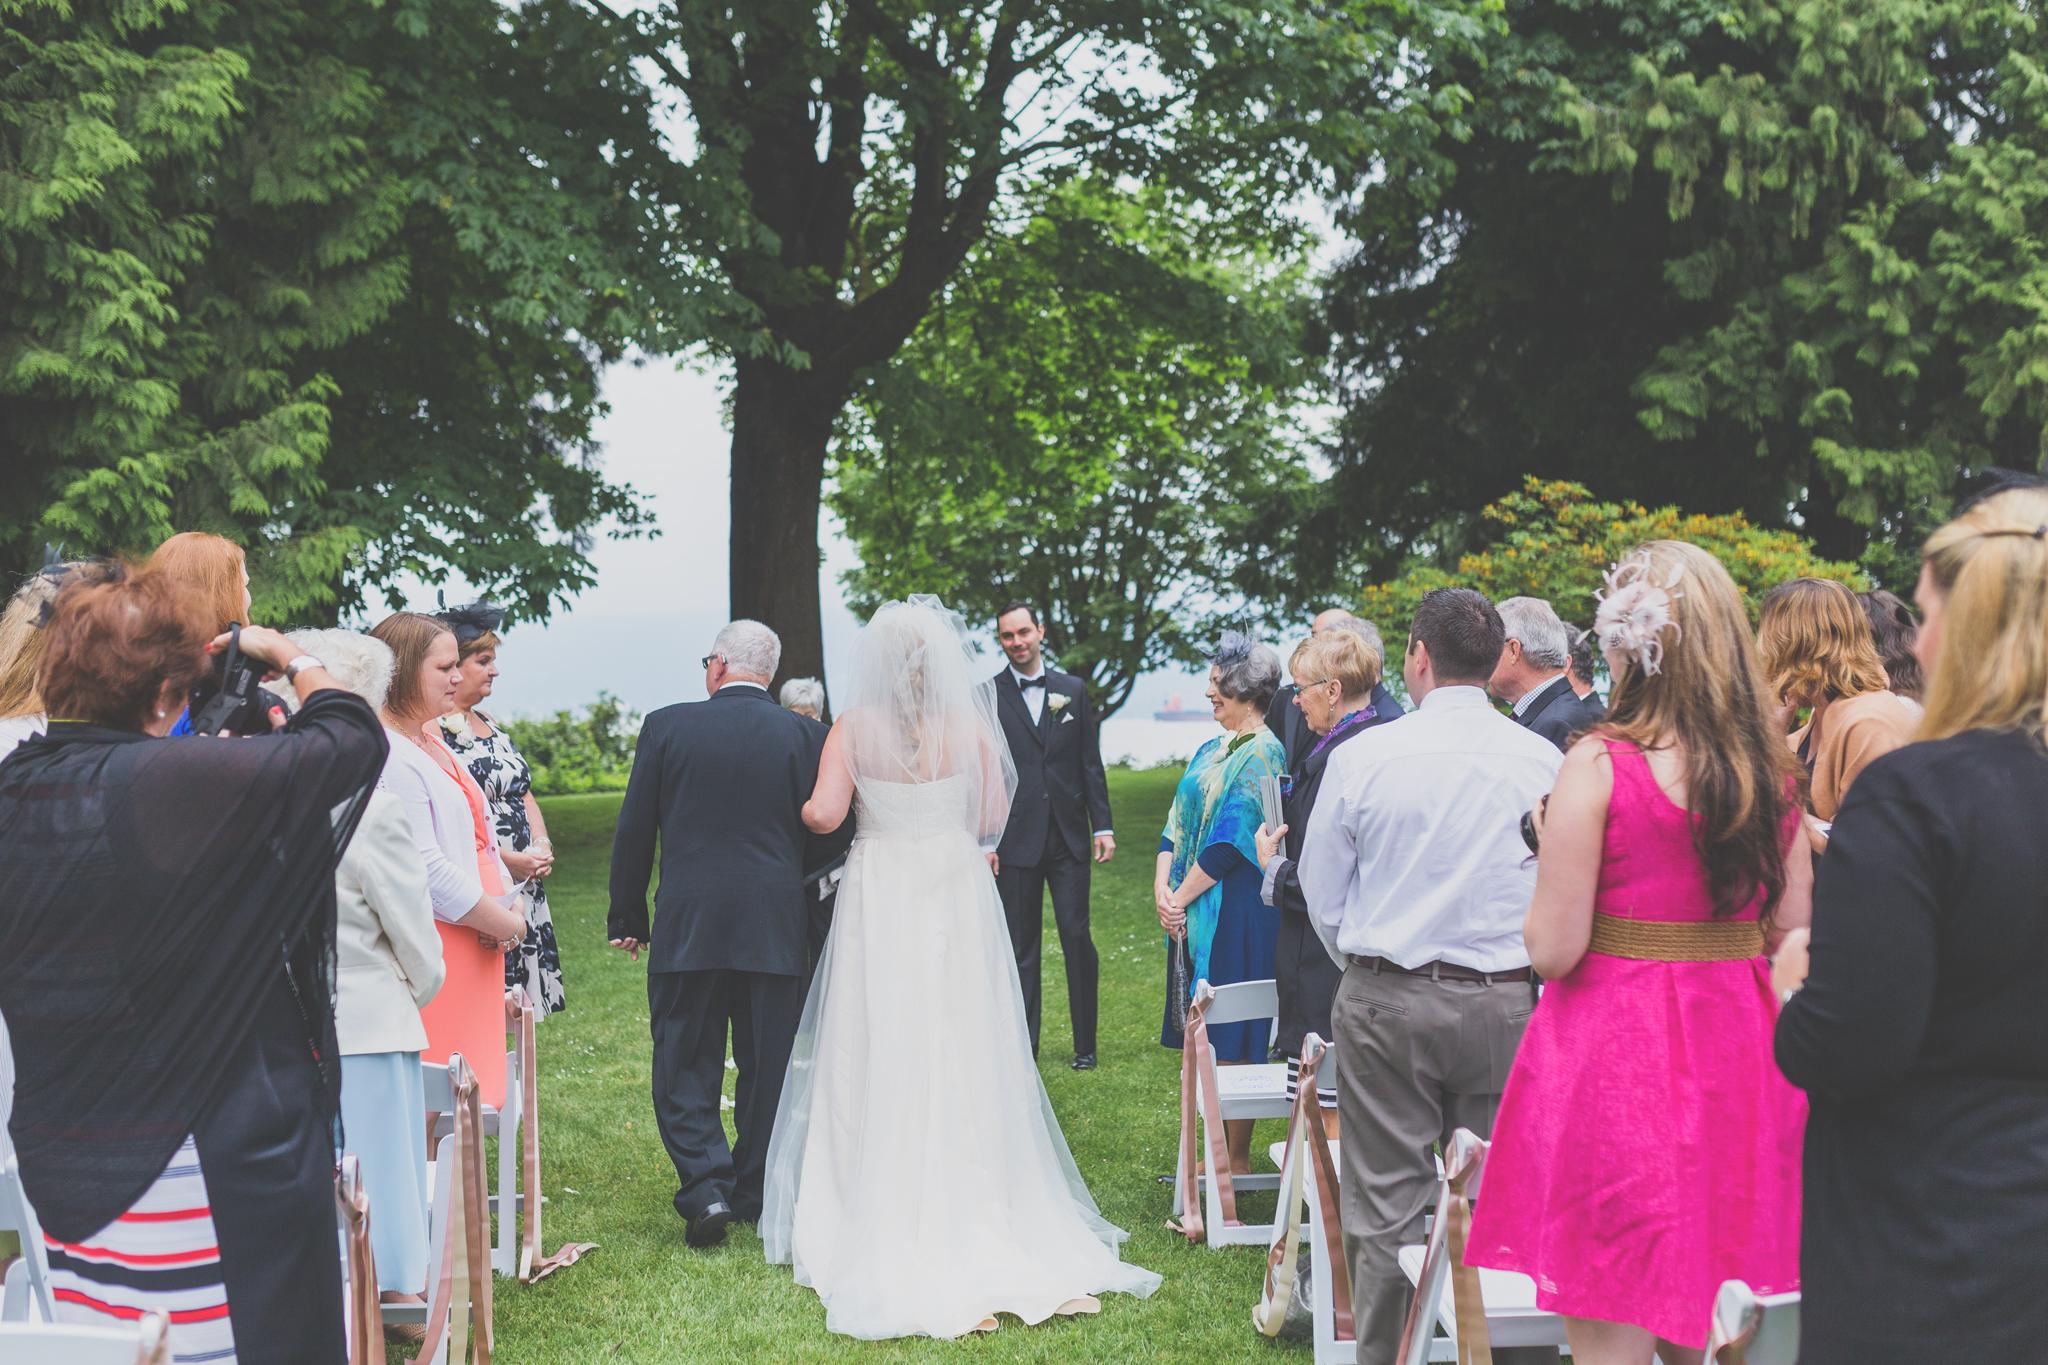 IMG_5335-VANCOUVER-WEDDING-PHOTOGRAPHER-JENNIFER-PICARD-PHOTOGRAPHY.jpg